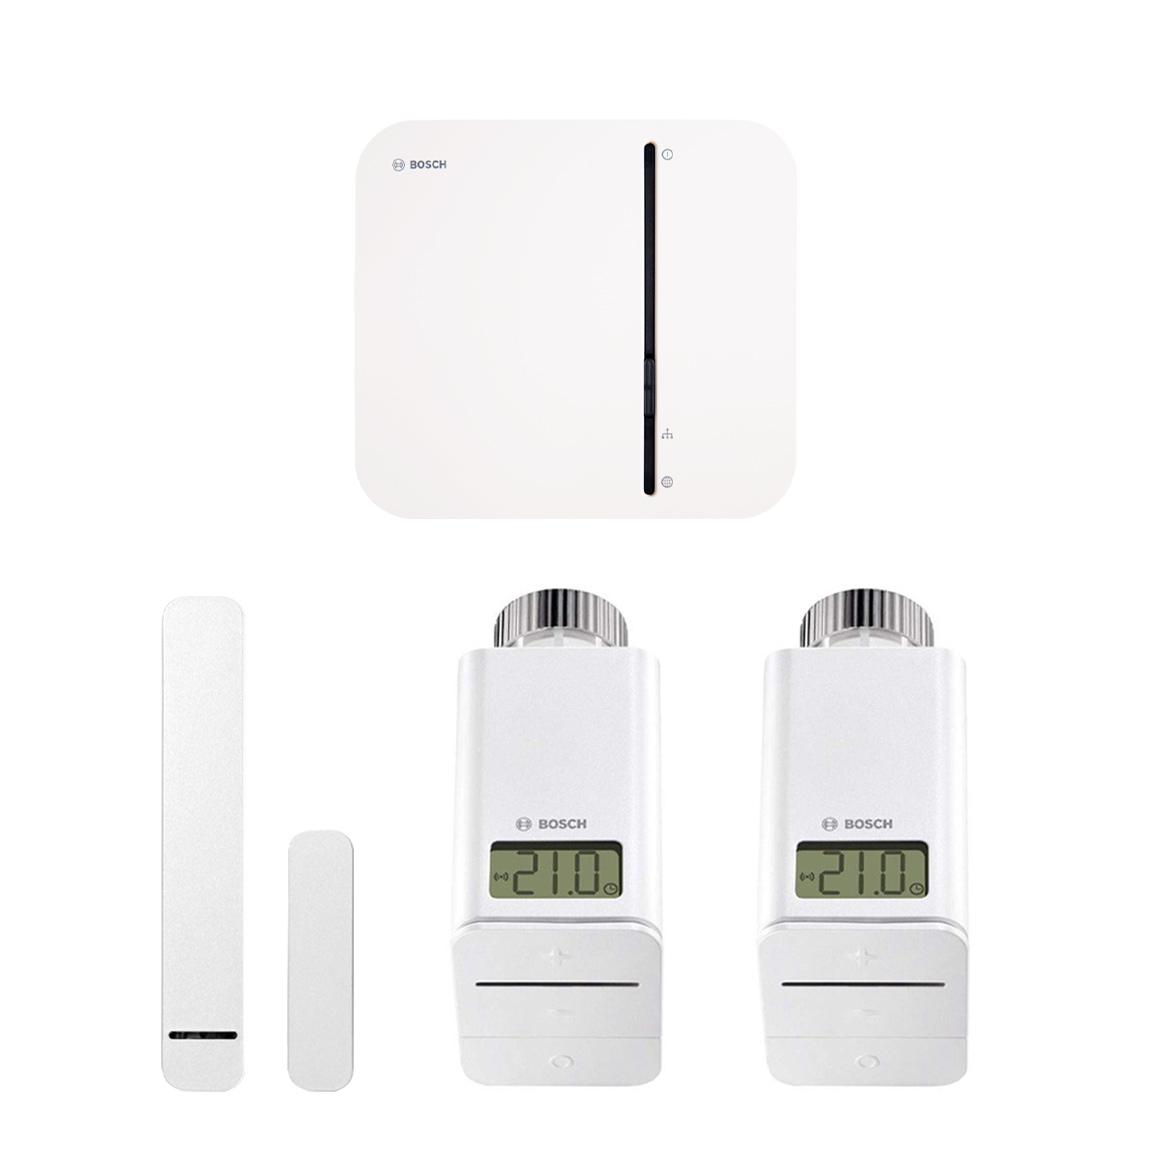 Bosch Smart Home - Starter Set Raumklima + gratis Twinguard + Twist